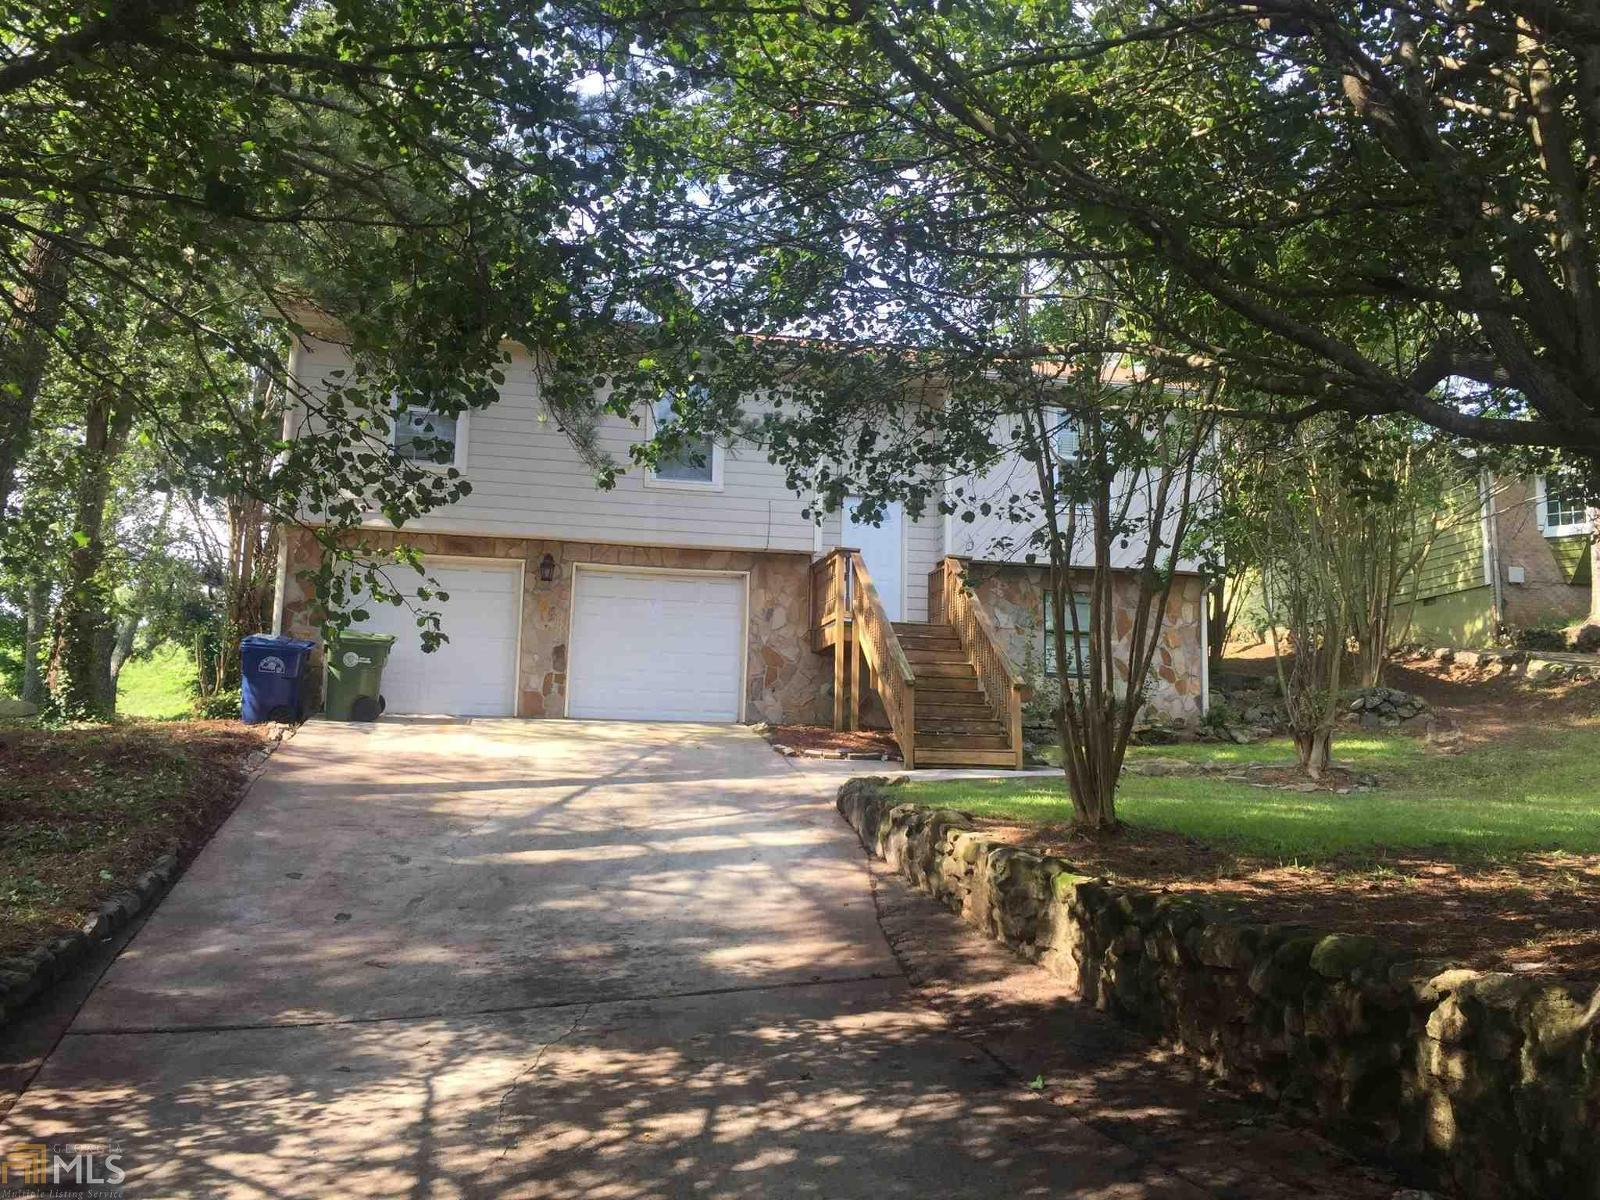 3806 n camp creek pkwy sw atlanta ga mls 8203383 better homes and gardens real estate